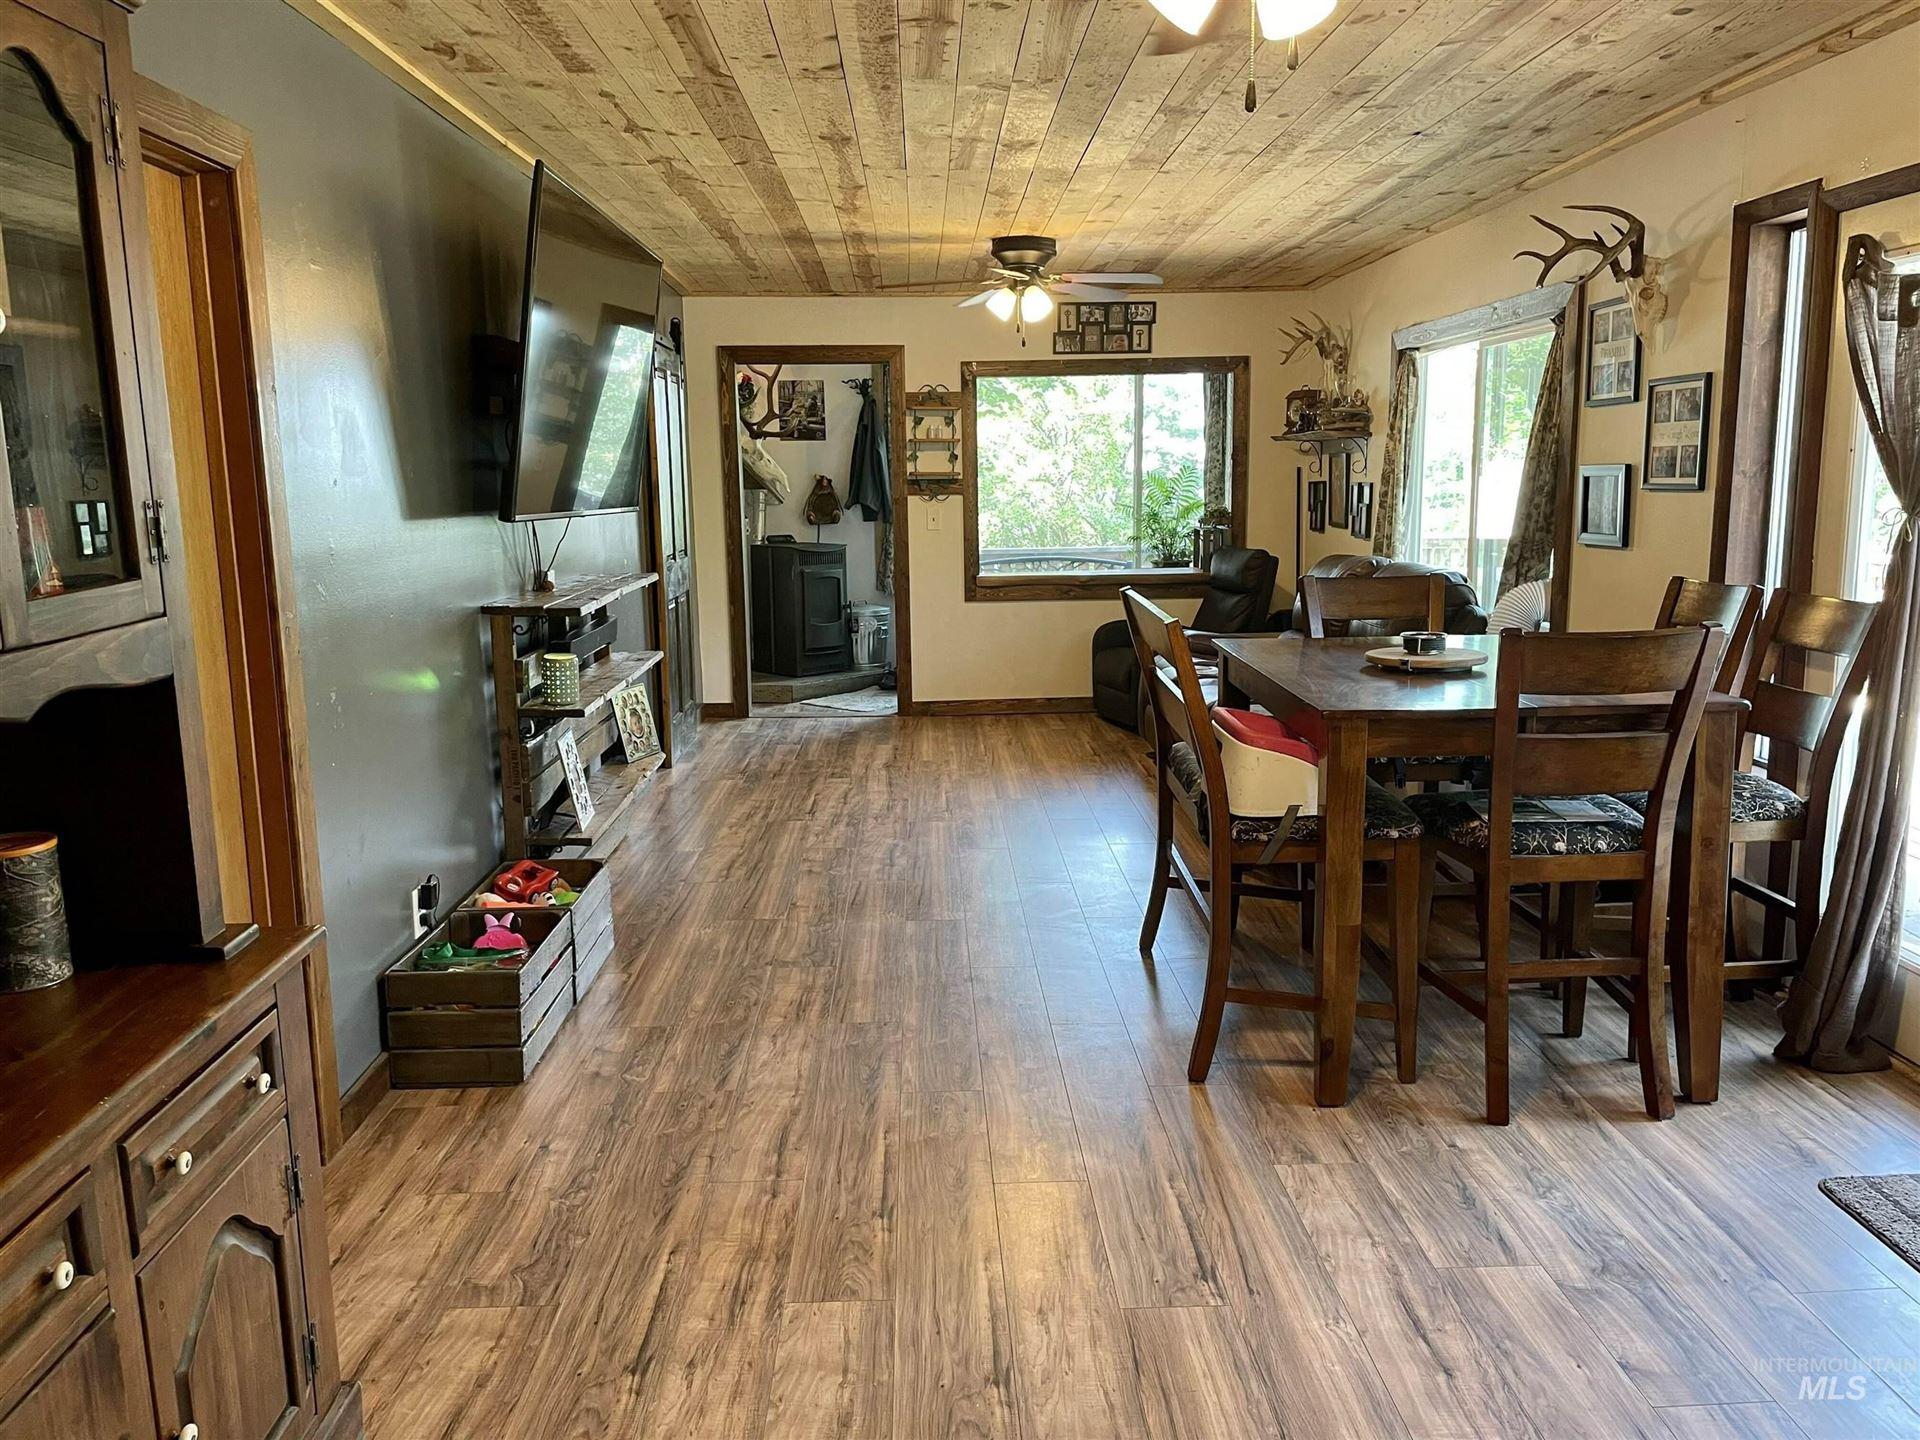 Photo of 1025 Pine, Potlatch, ID 83855 (MLS # 98813693)